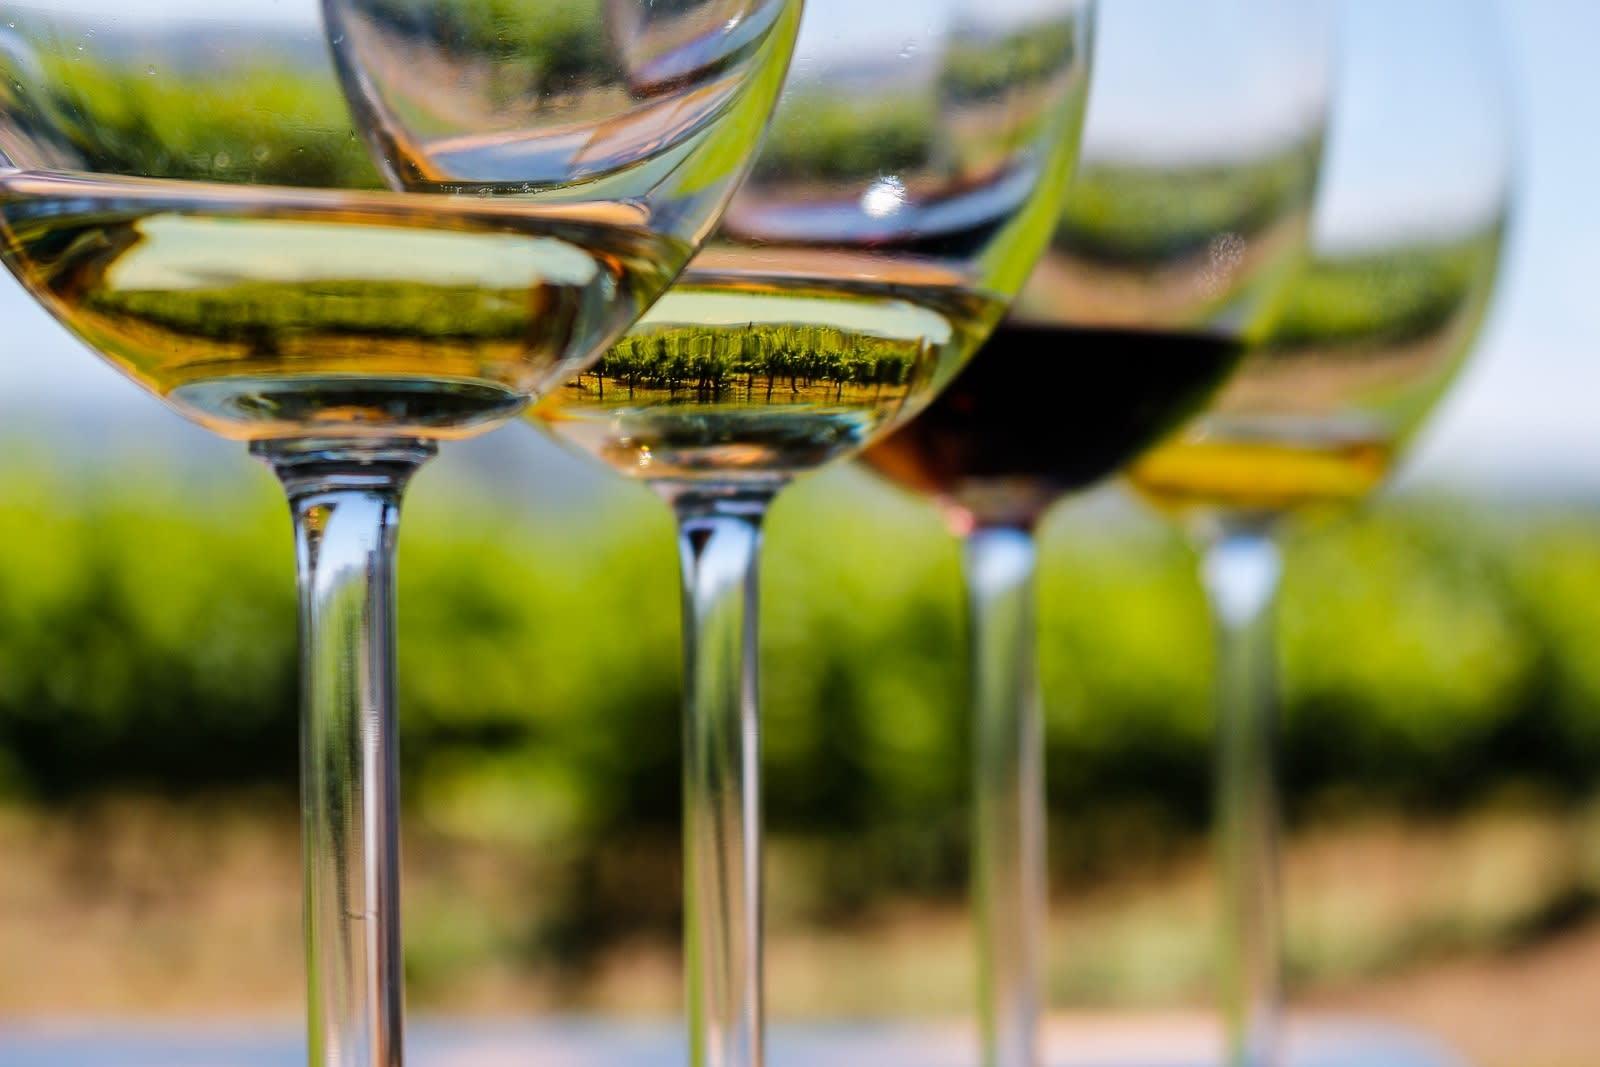 Vineyard in a Glass